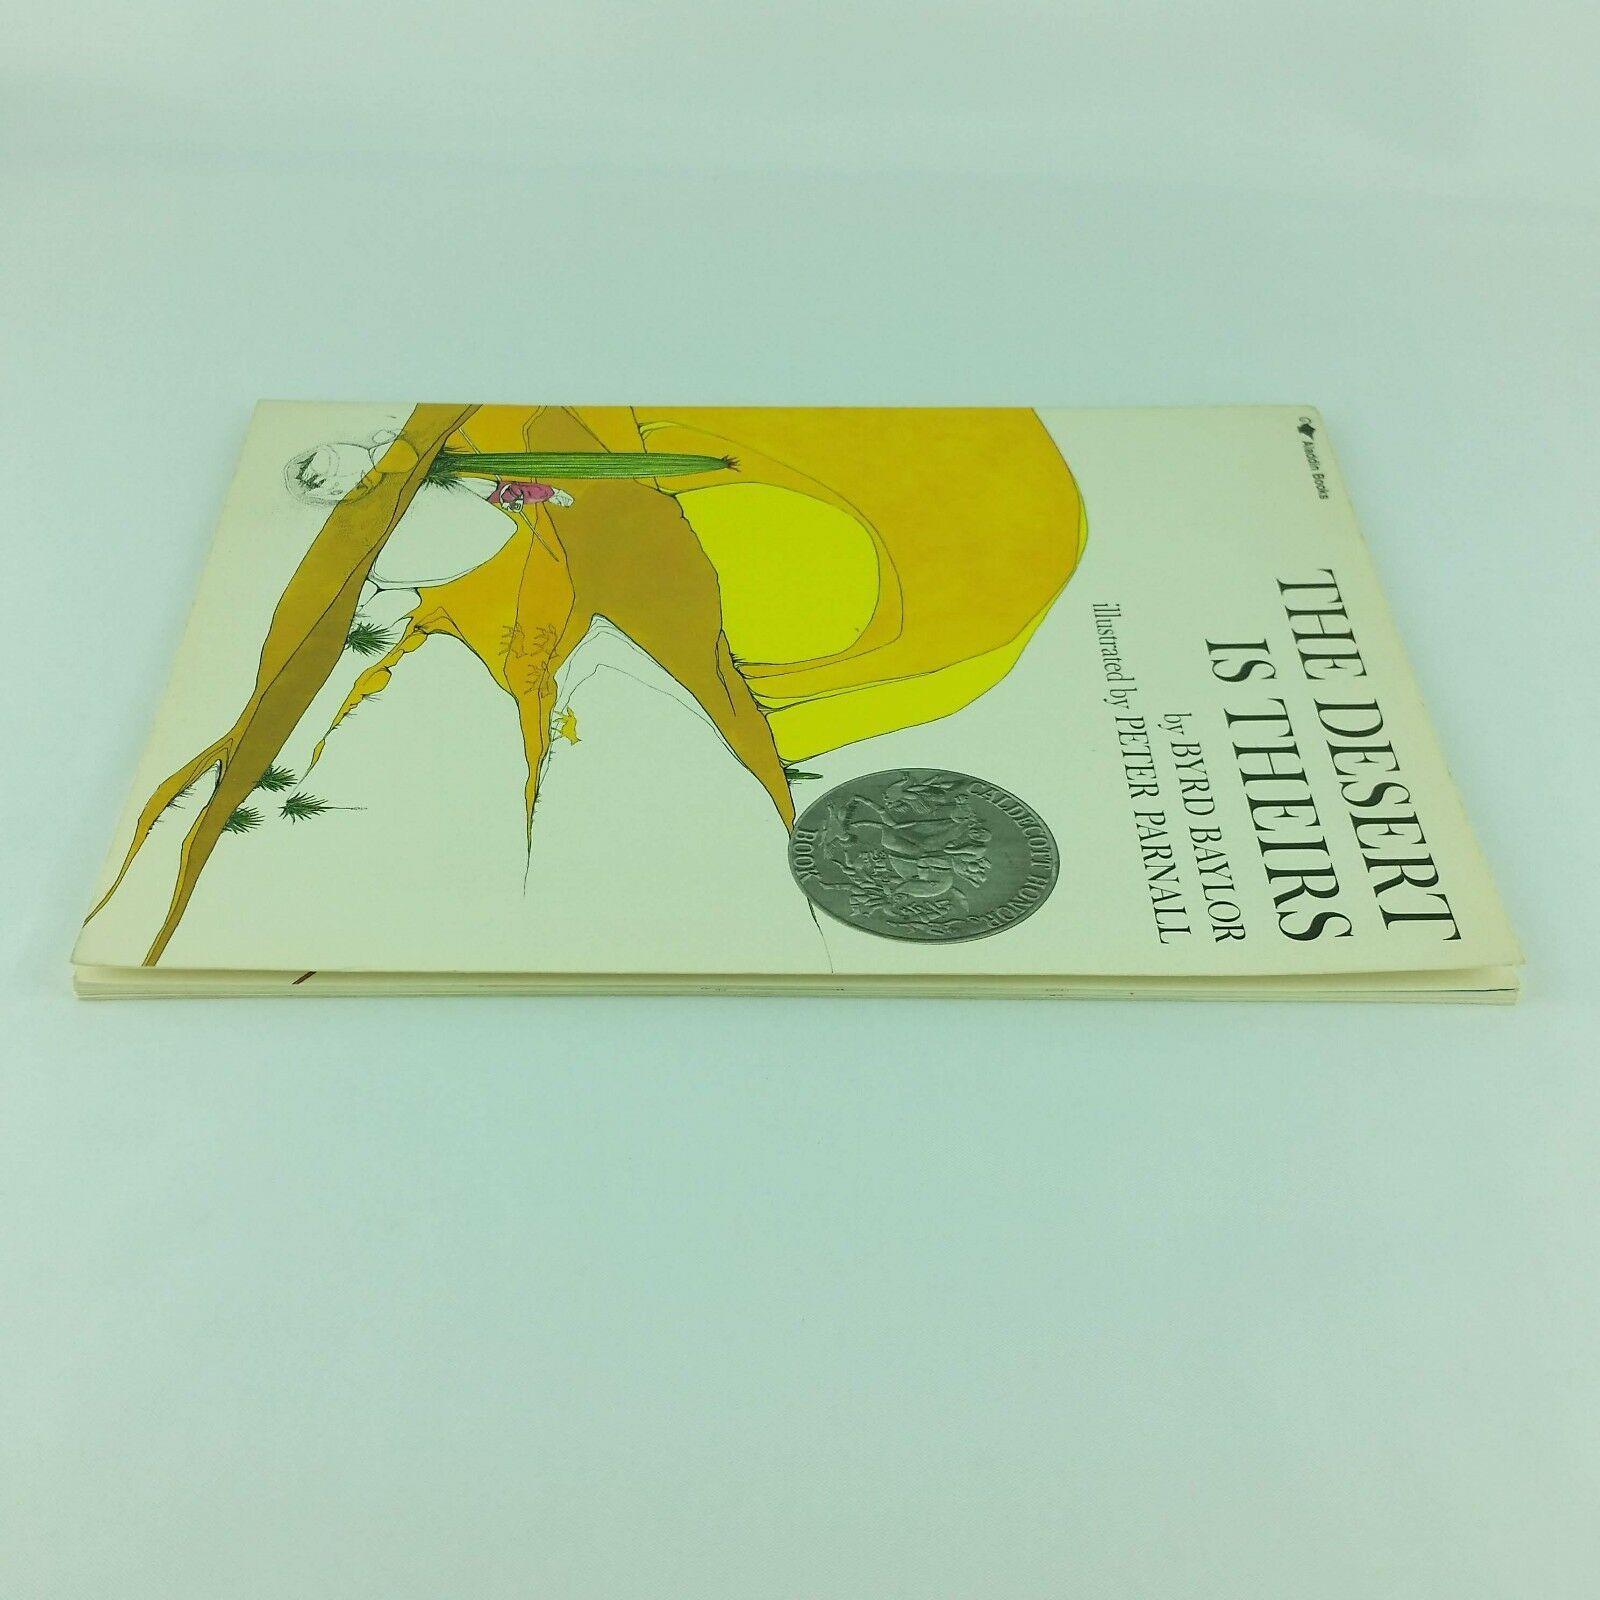 The Desert is Theirs 1987 Childrens Vintage Book Byrd Baylor Signed Paperback